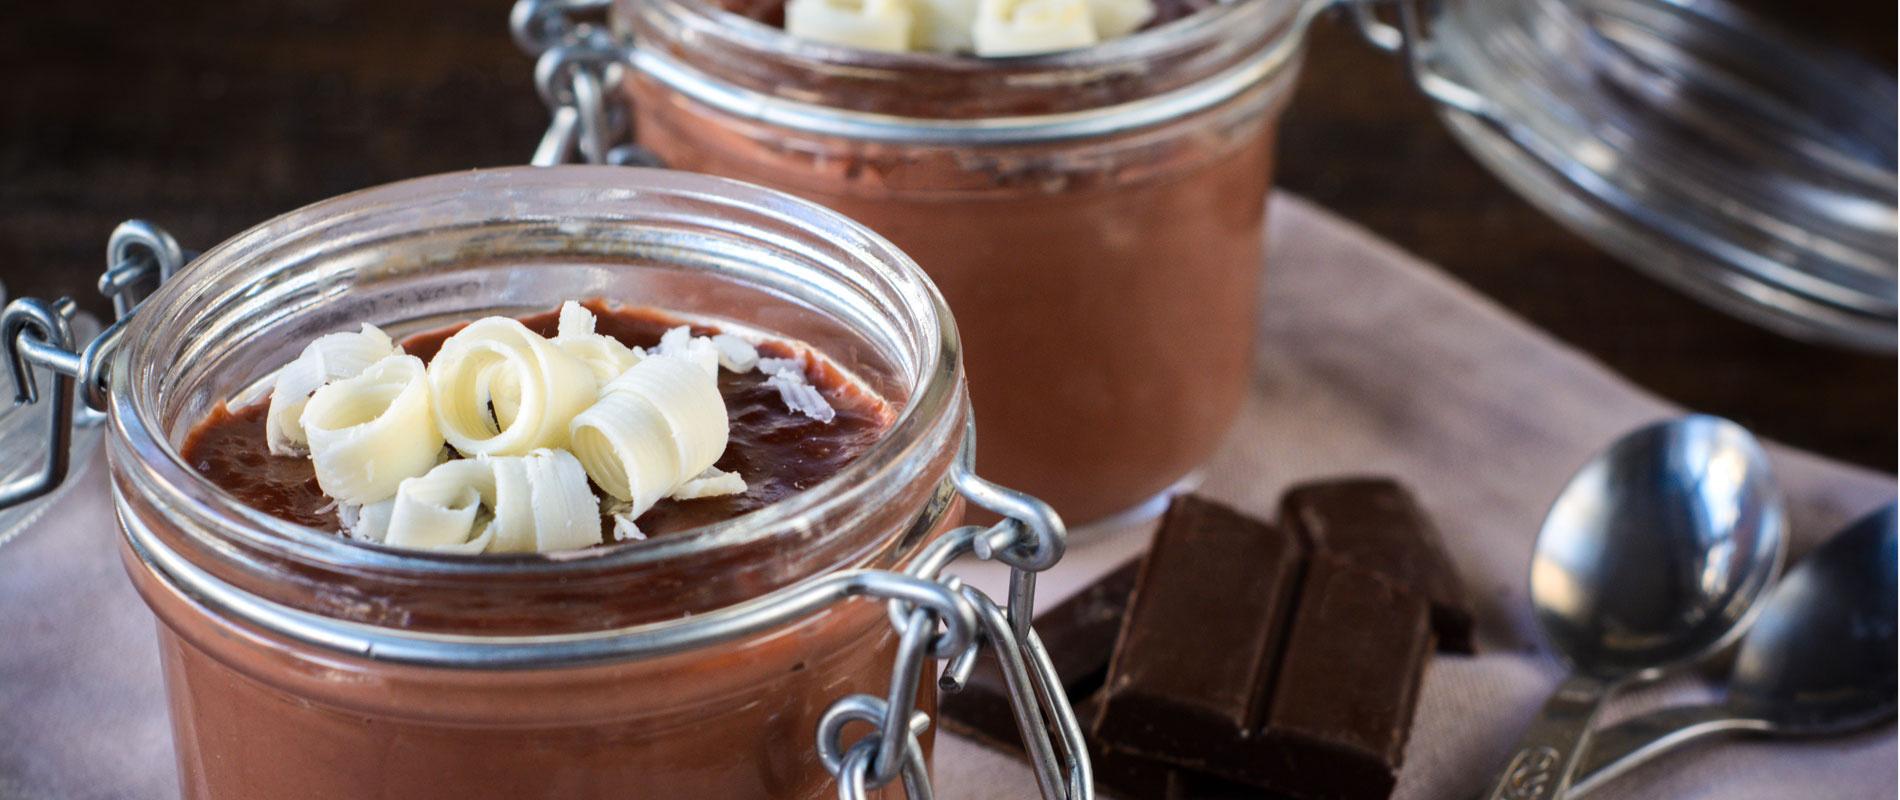 csokikrémcover